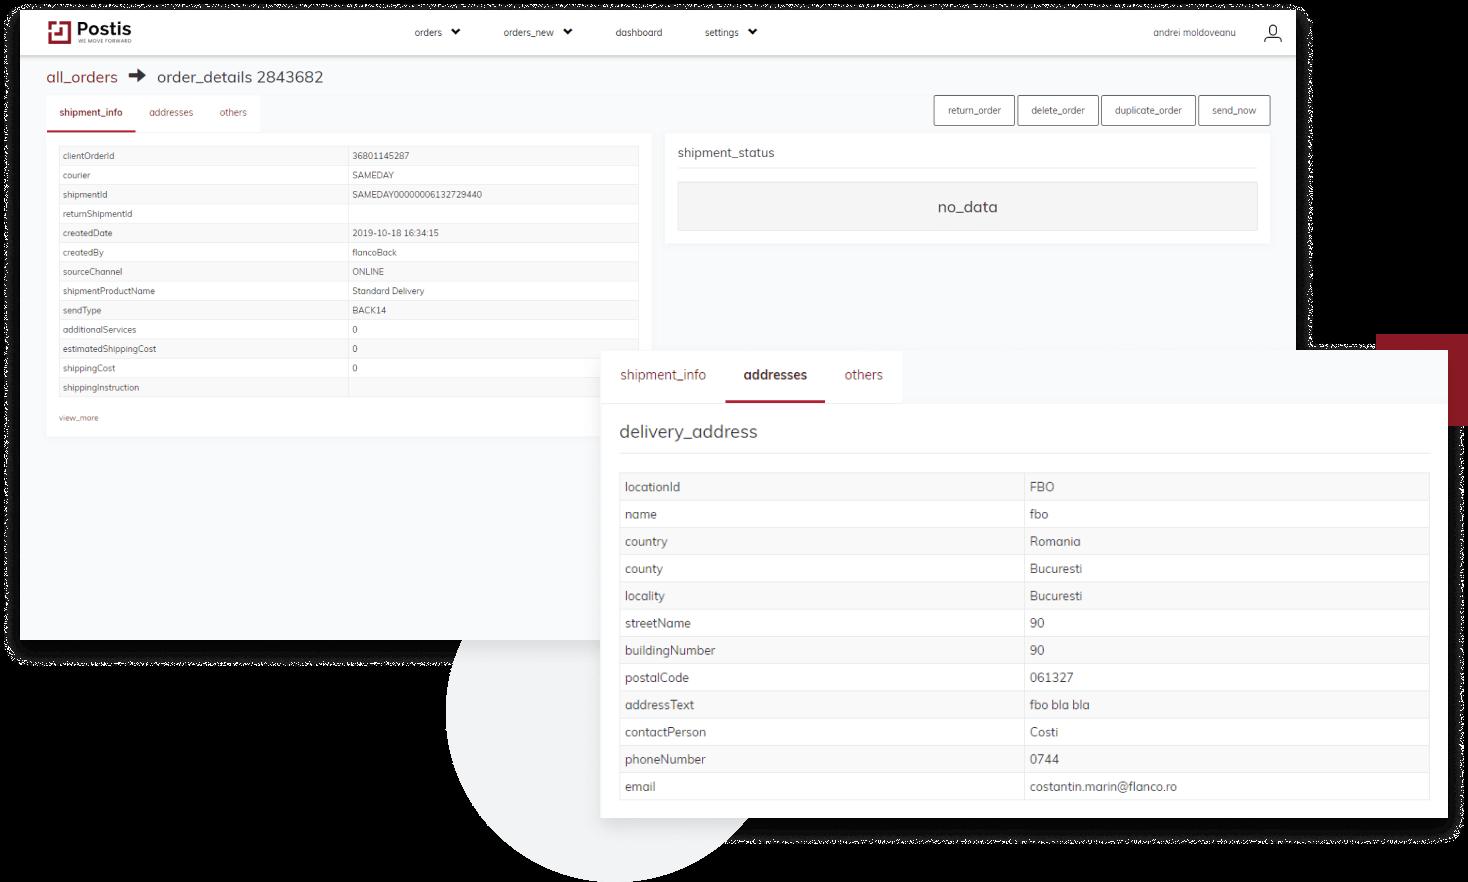 postis web platform screenshots, order shipping details